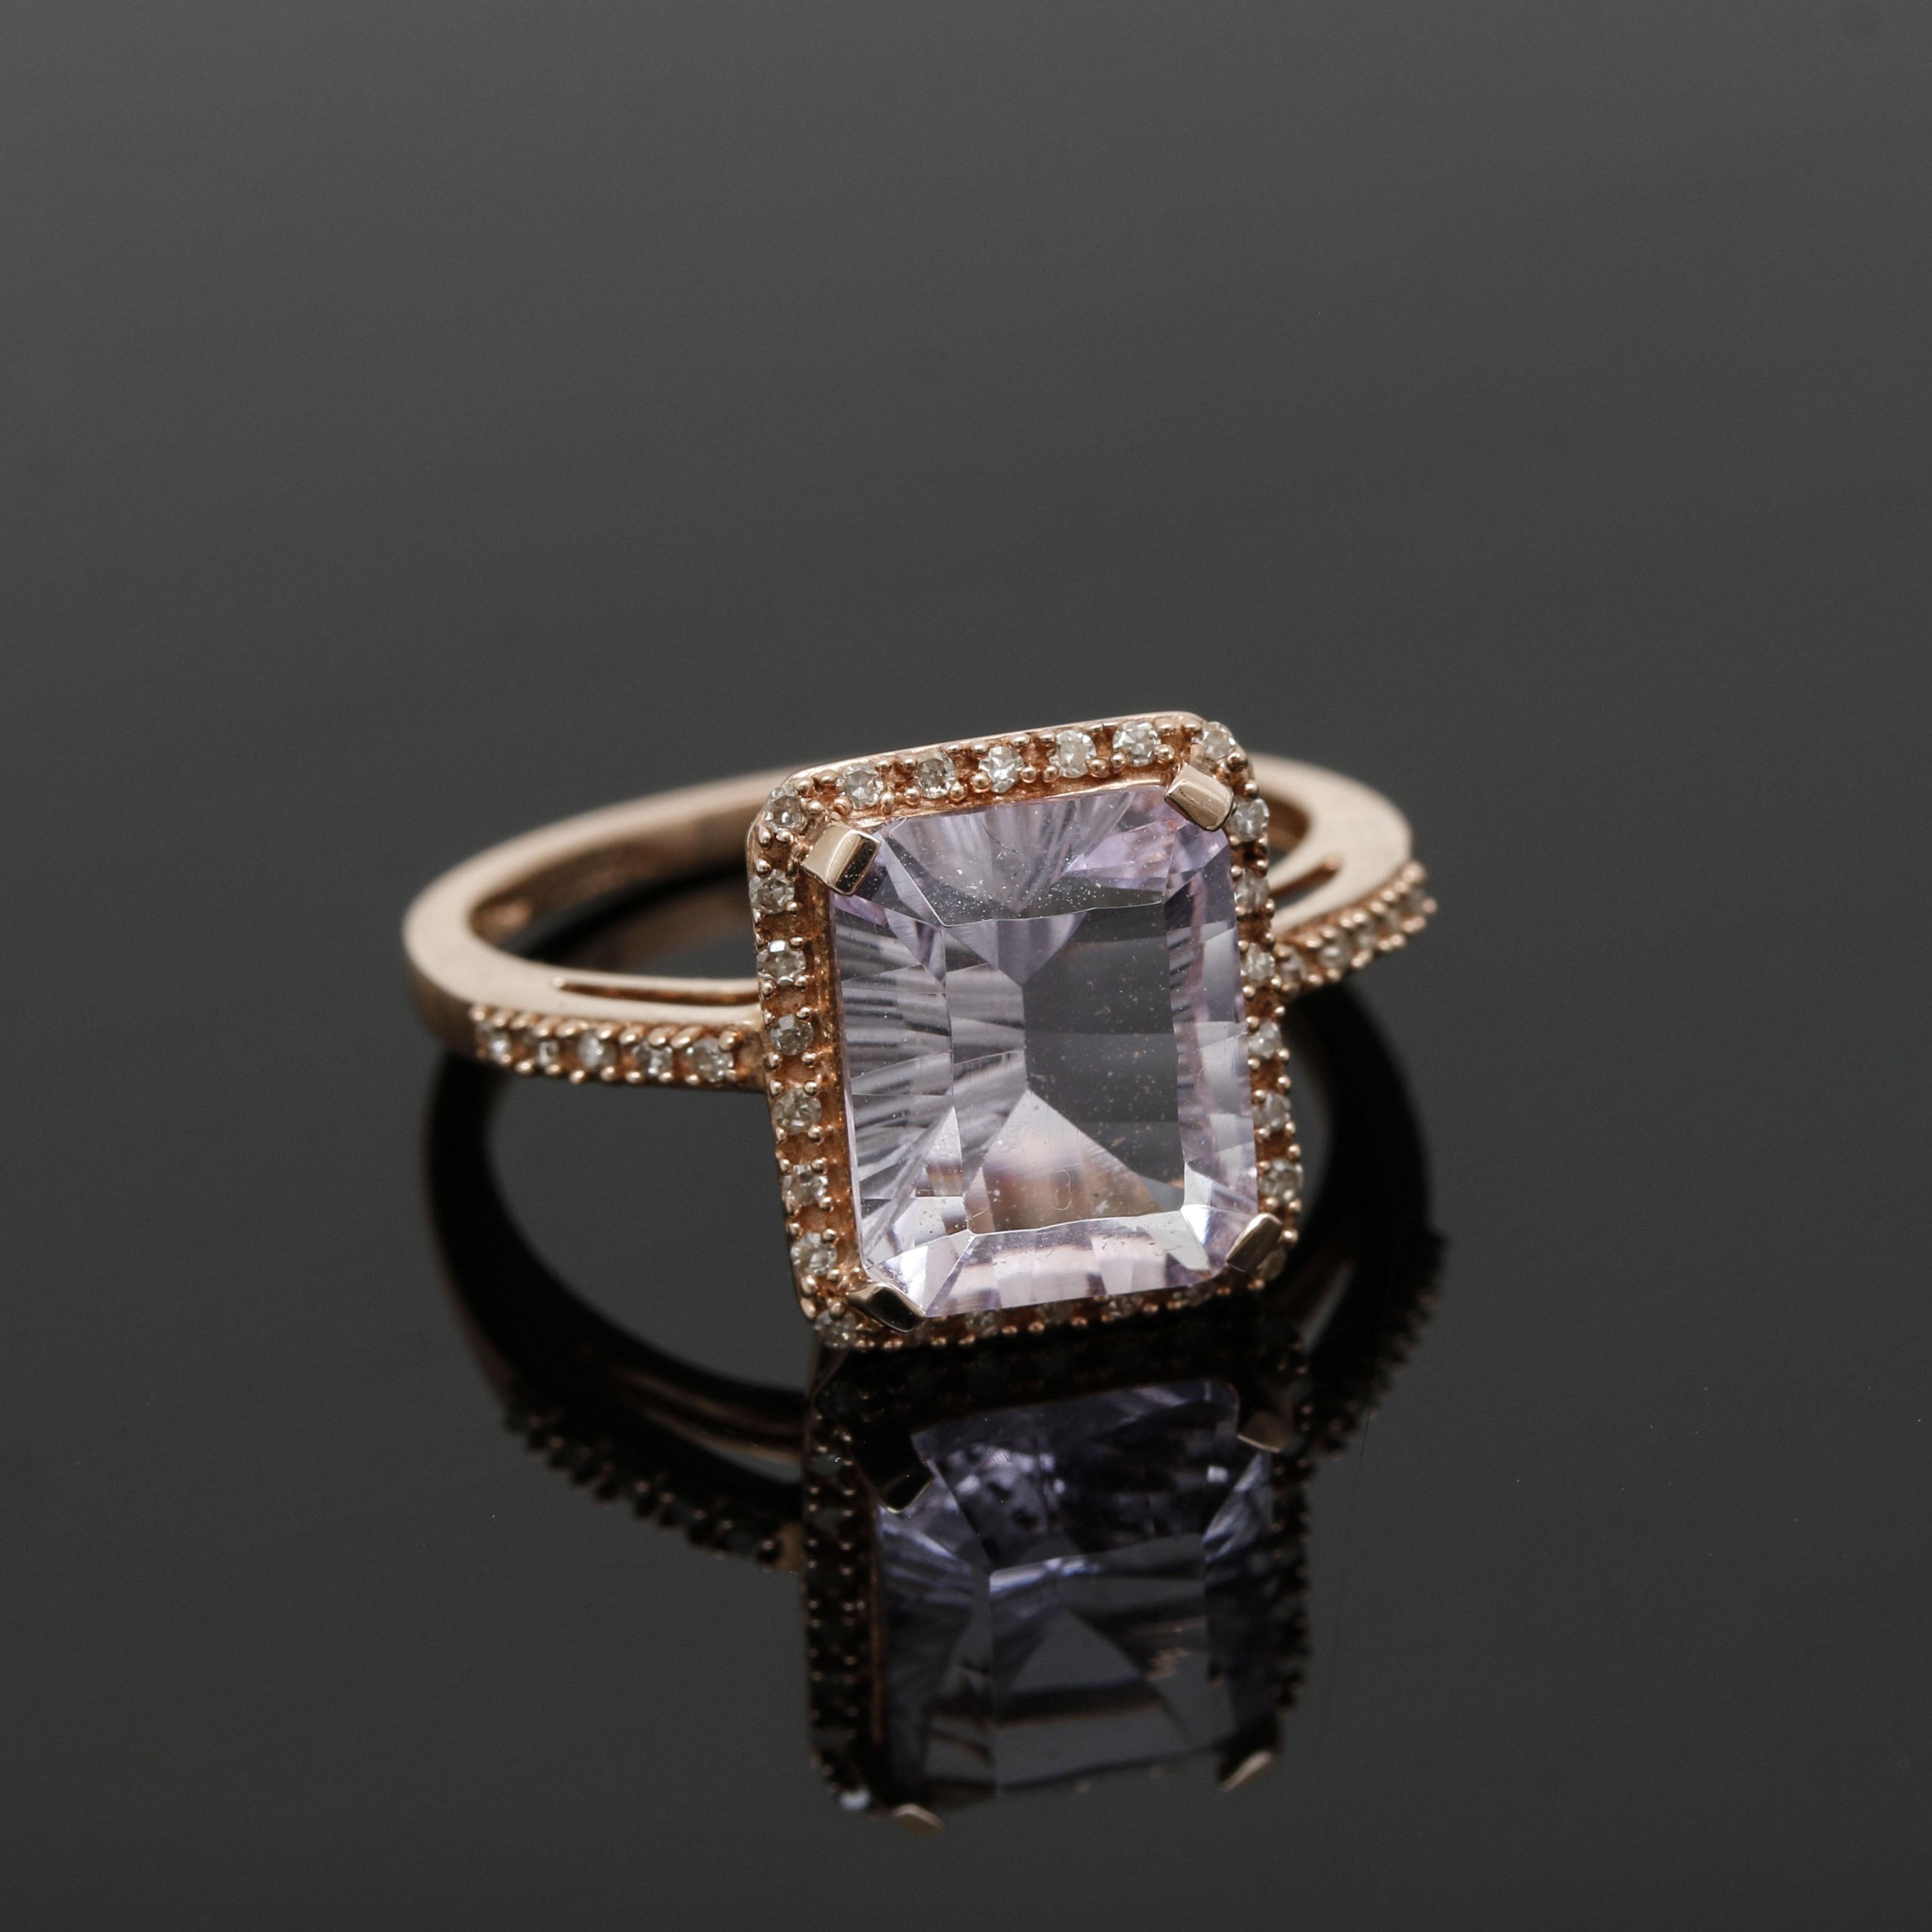 10K Rose Gold Amethyst and Diamond Ring